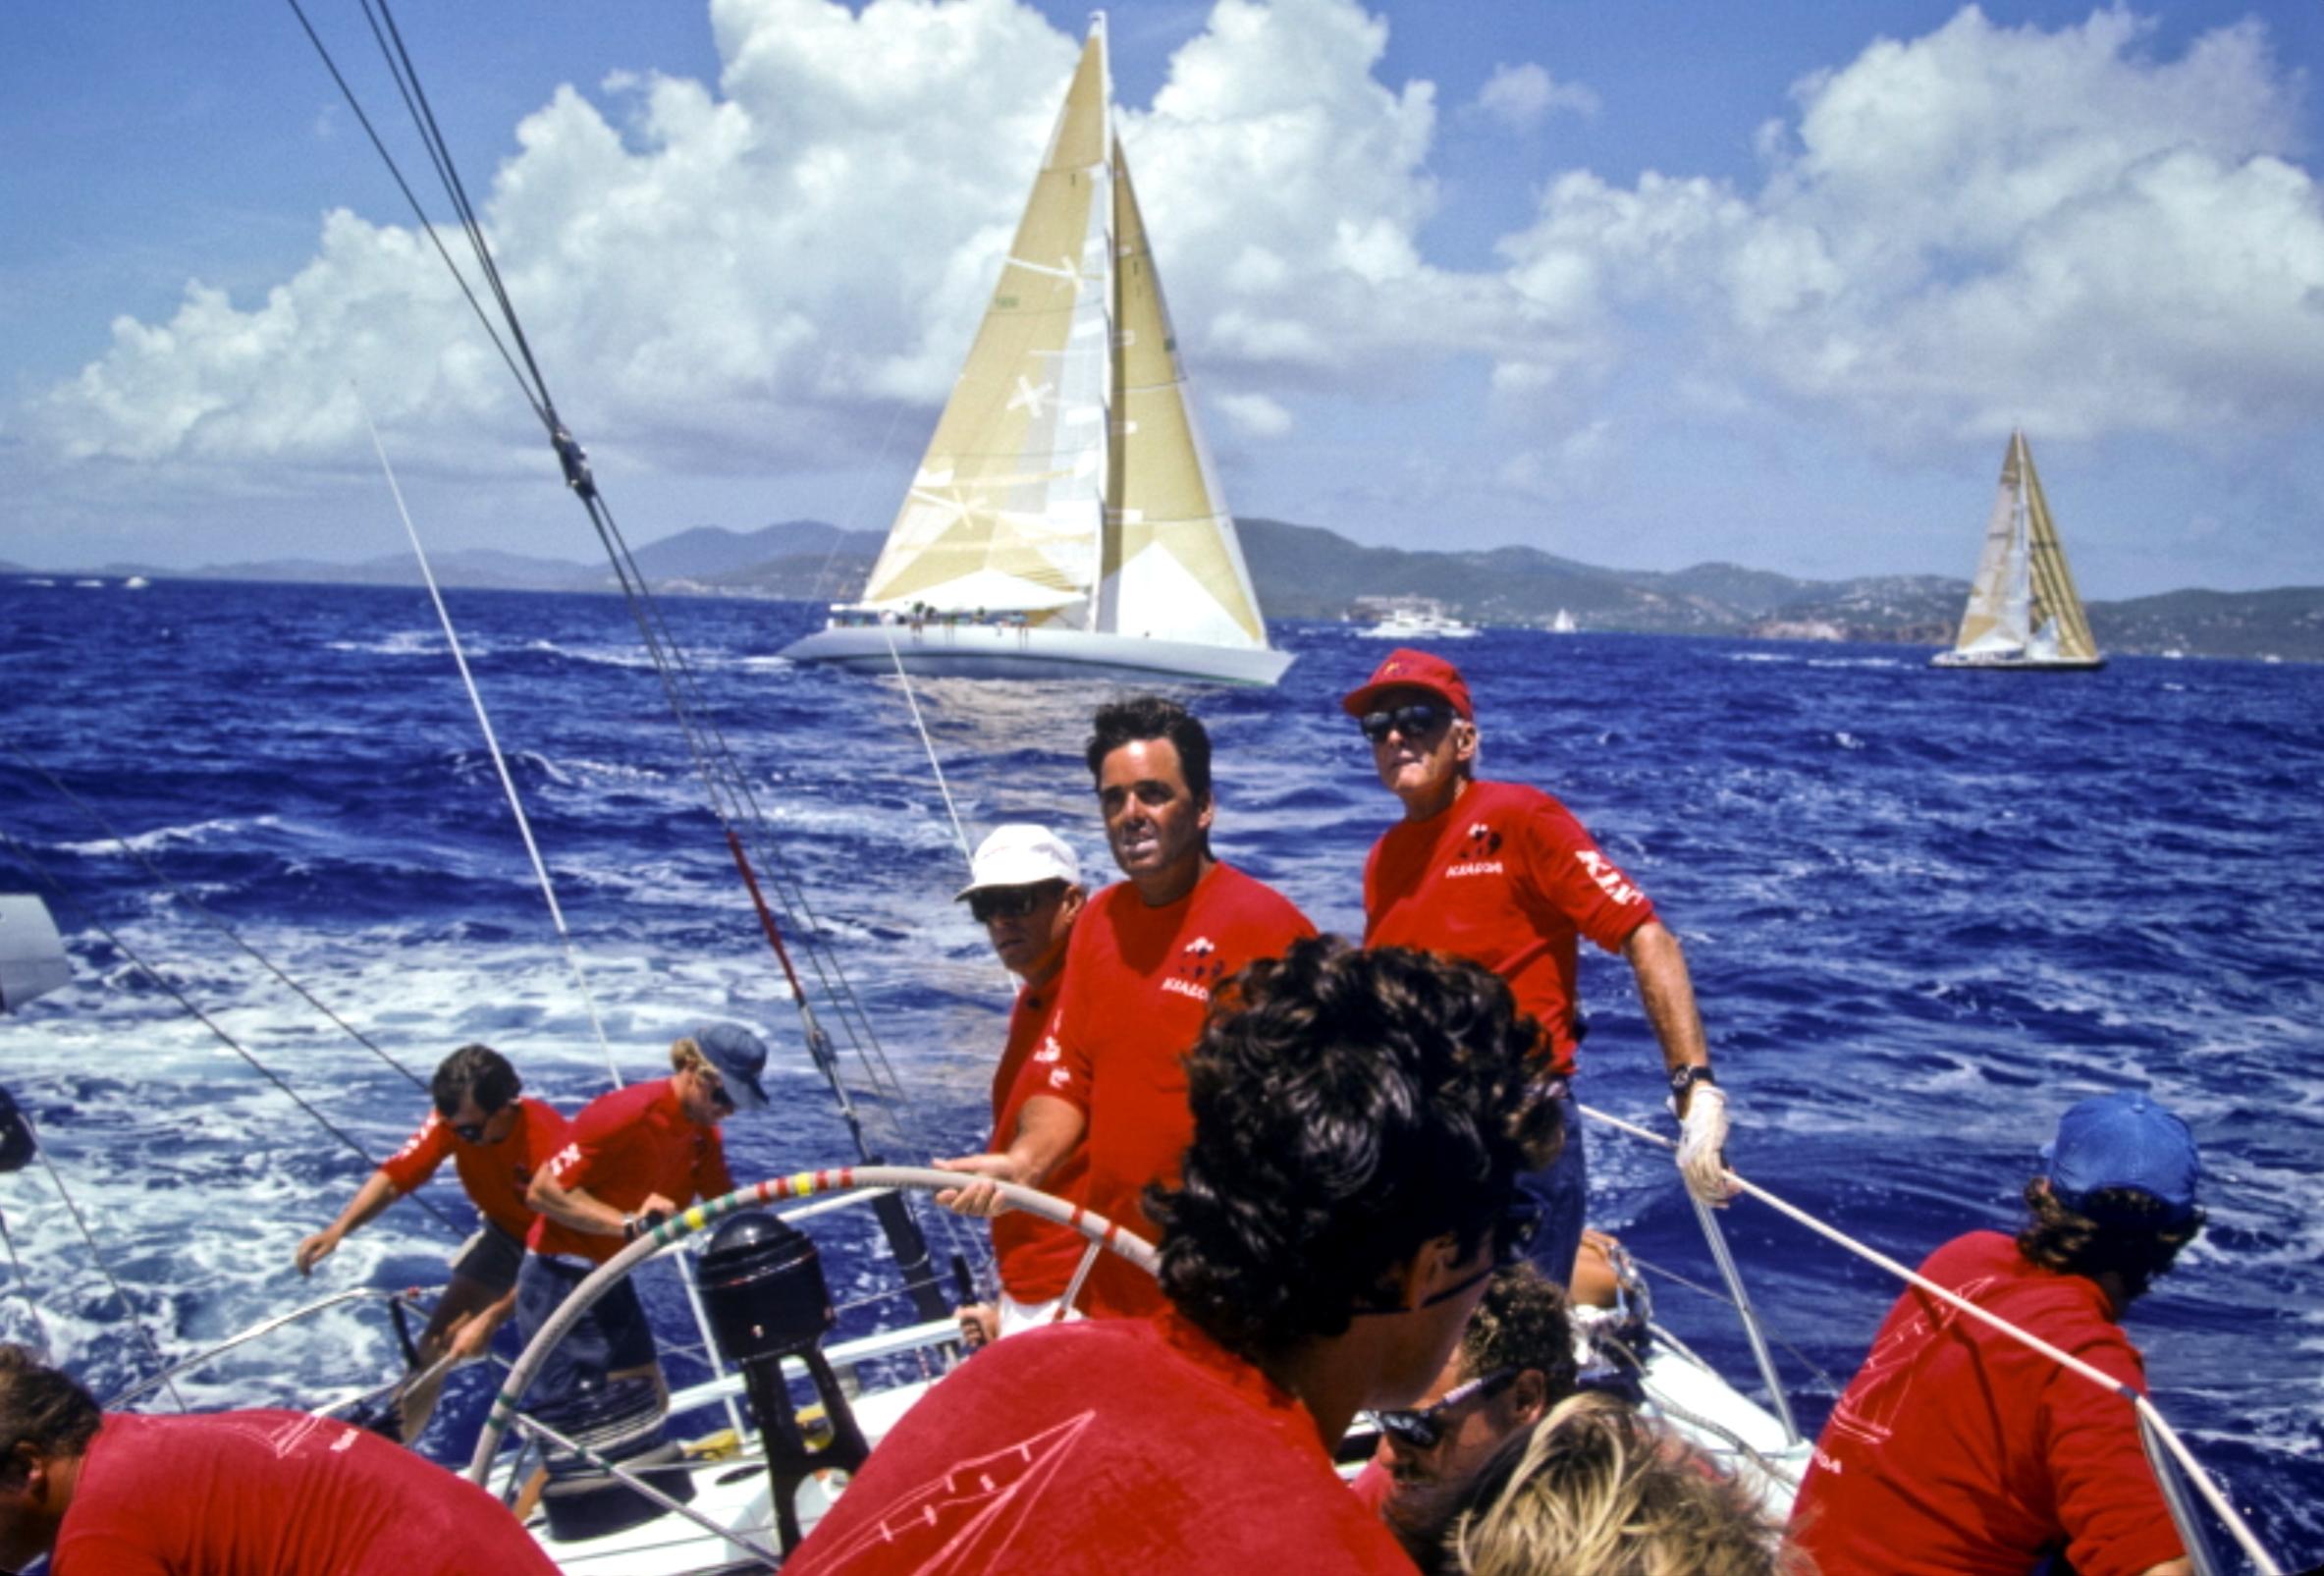 1980s, Kioloa IV, Dennis Connor steering